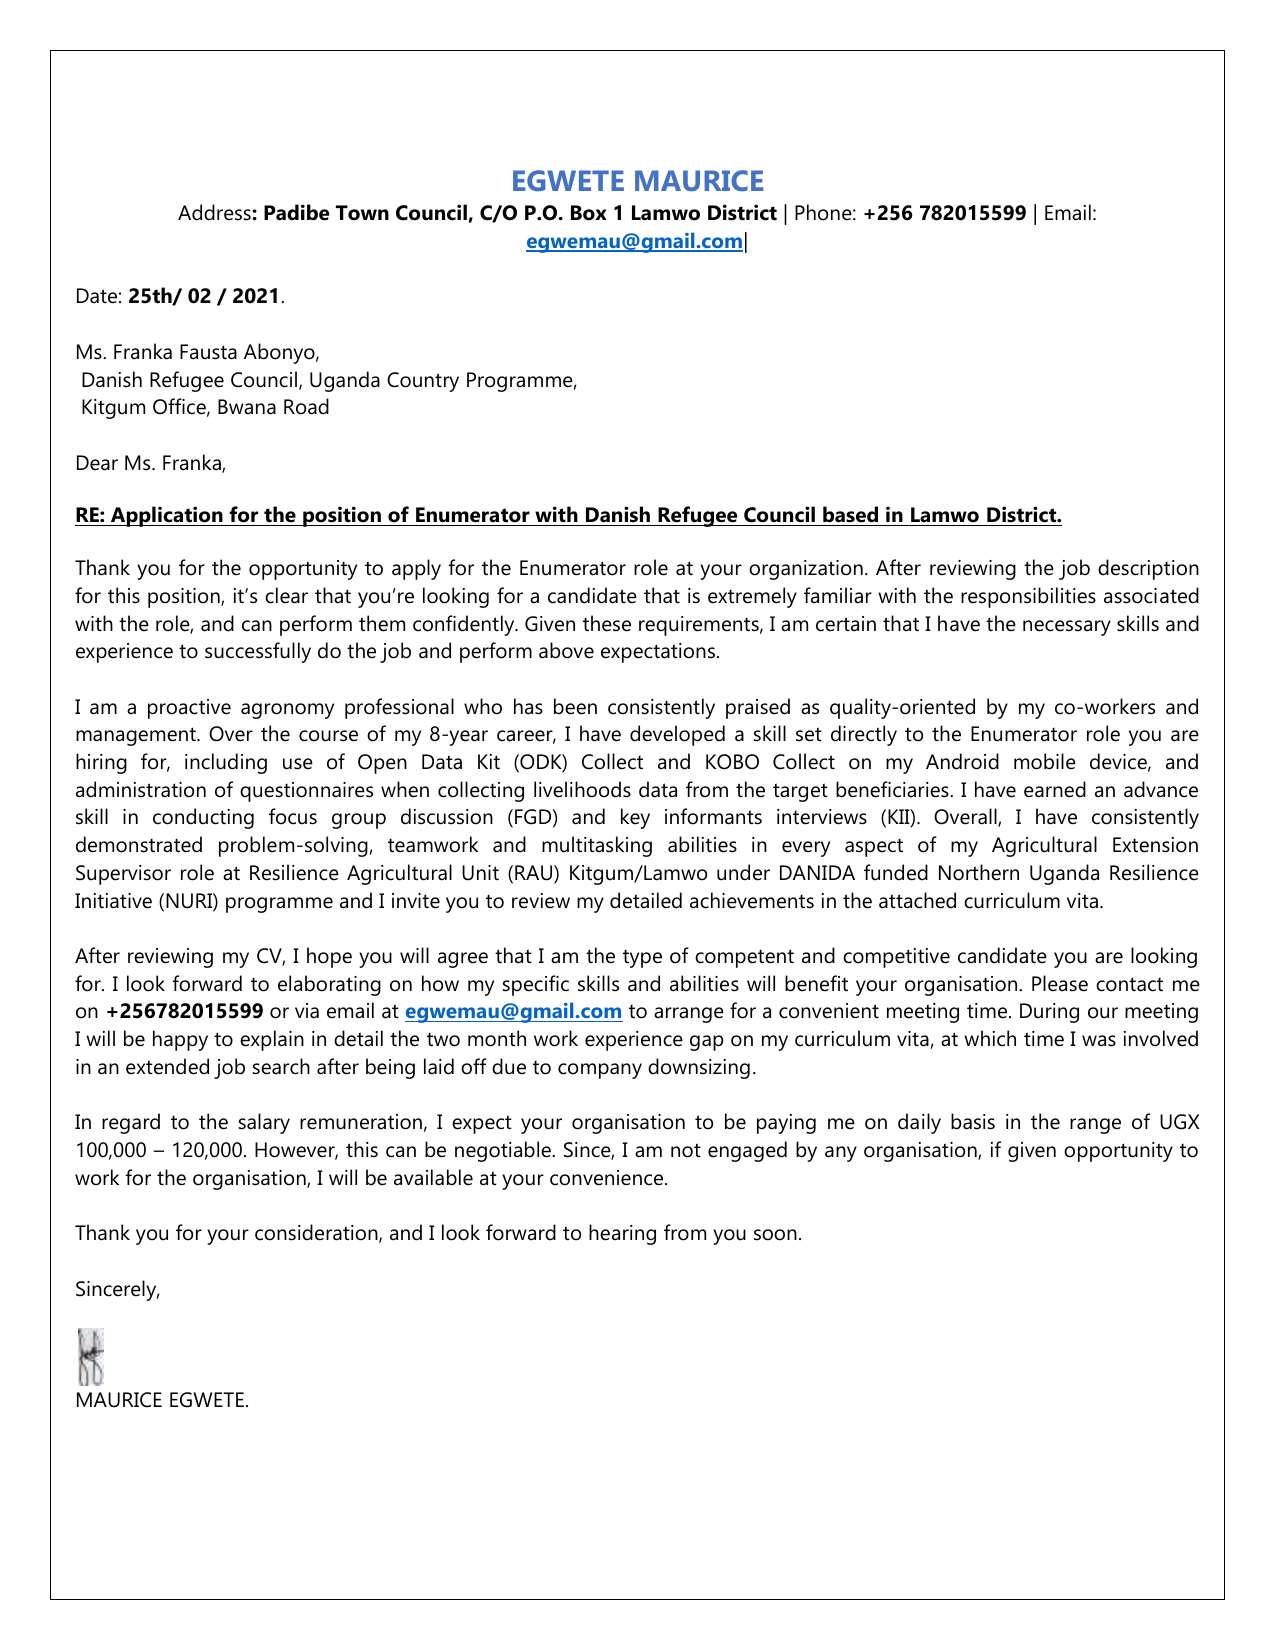 Maurice Cover Letter Cv Enumerator Drc